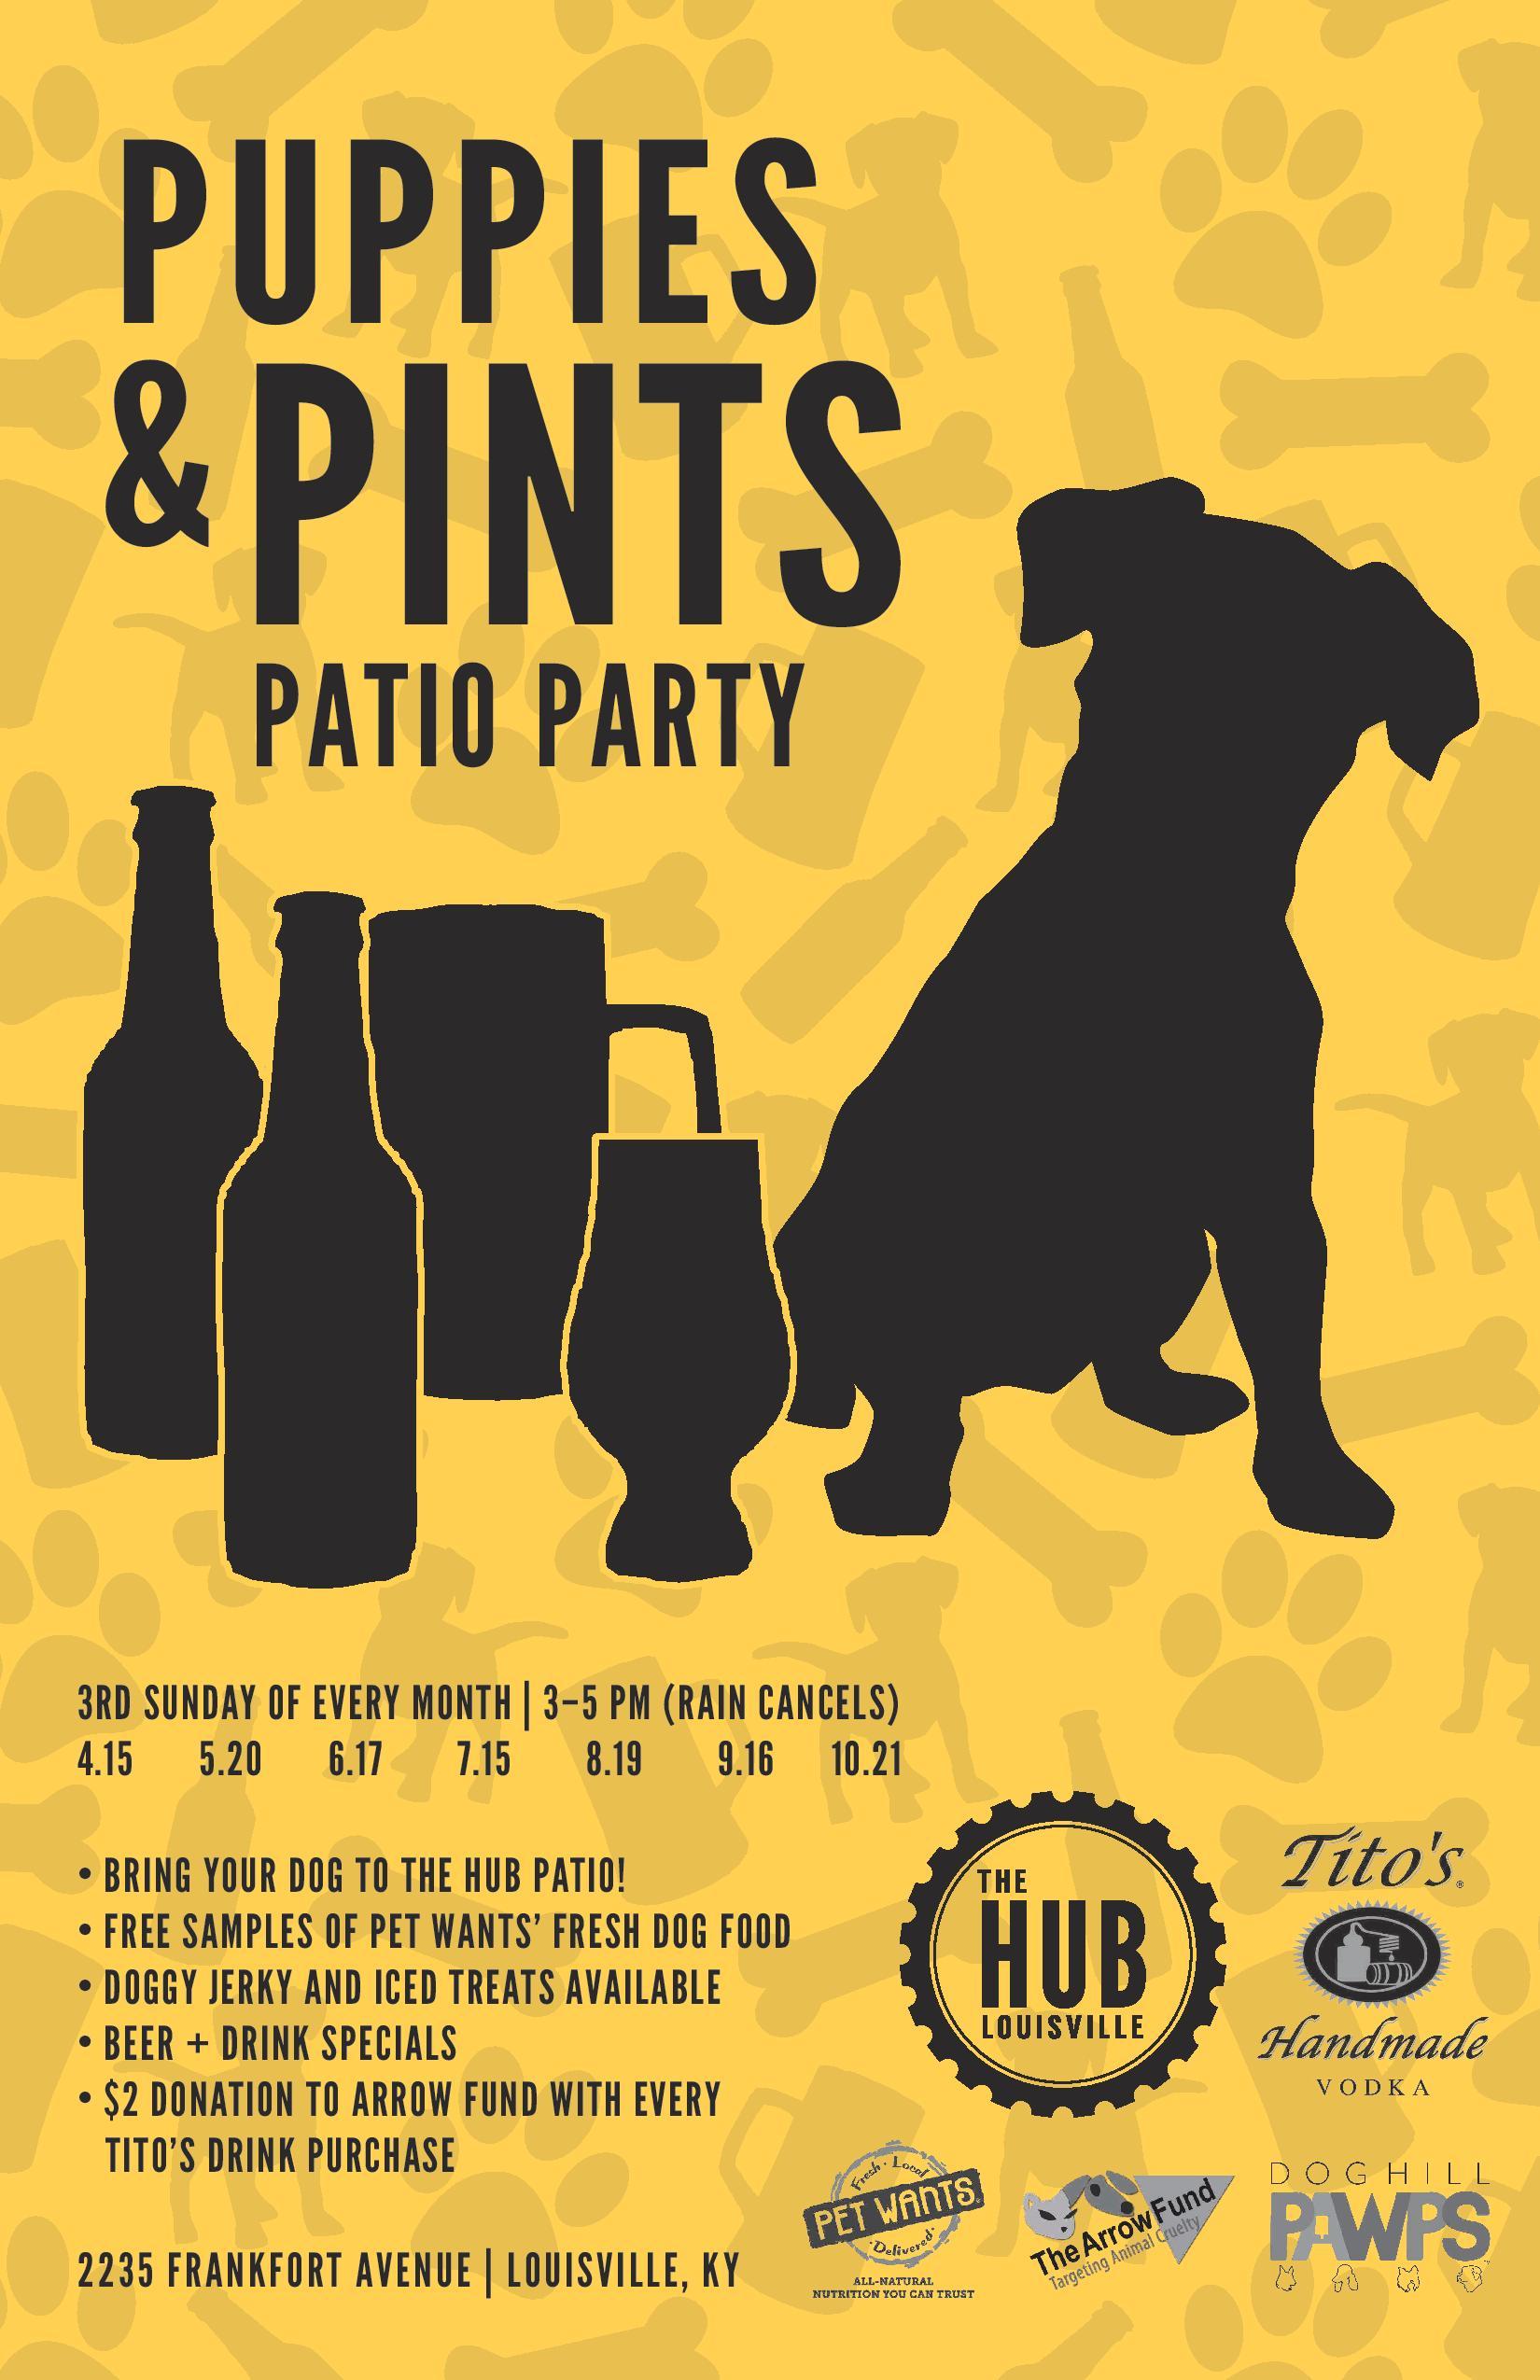 TheHub_PuppiesAndPints_Poster_2108-page-001.jpg